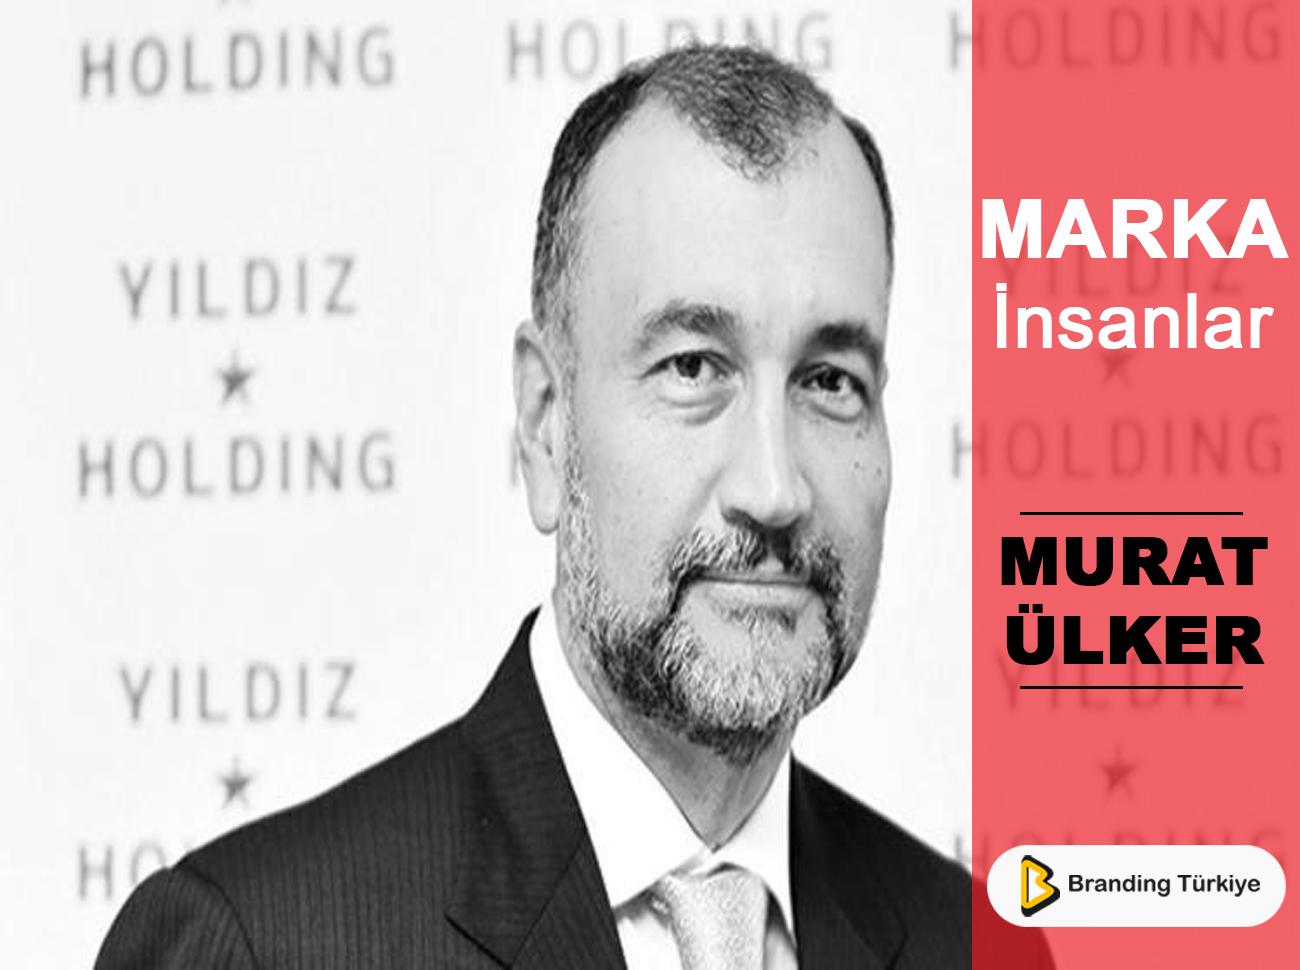 Marka İnsanlar: Murat Ülker